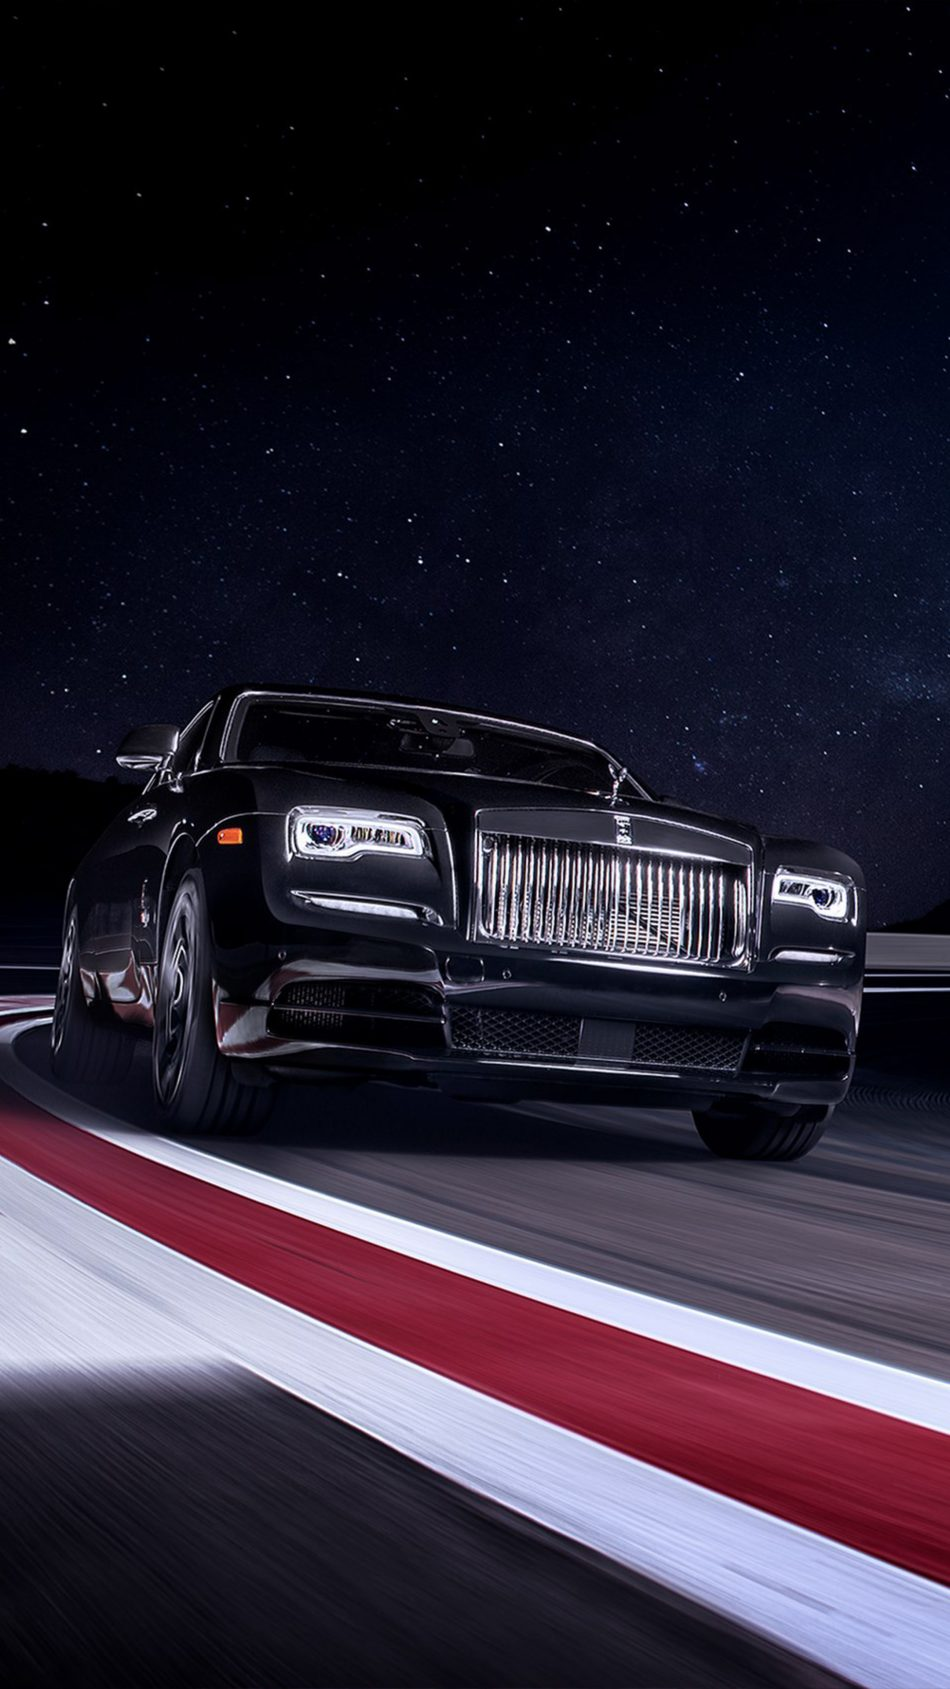 Rolls Royce Black Badge Wraith On Race Track 4k Ultra Hd Mobile Wallpaper